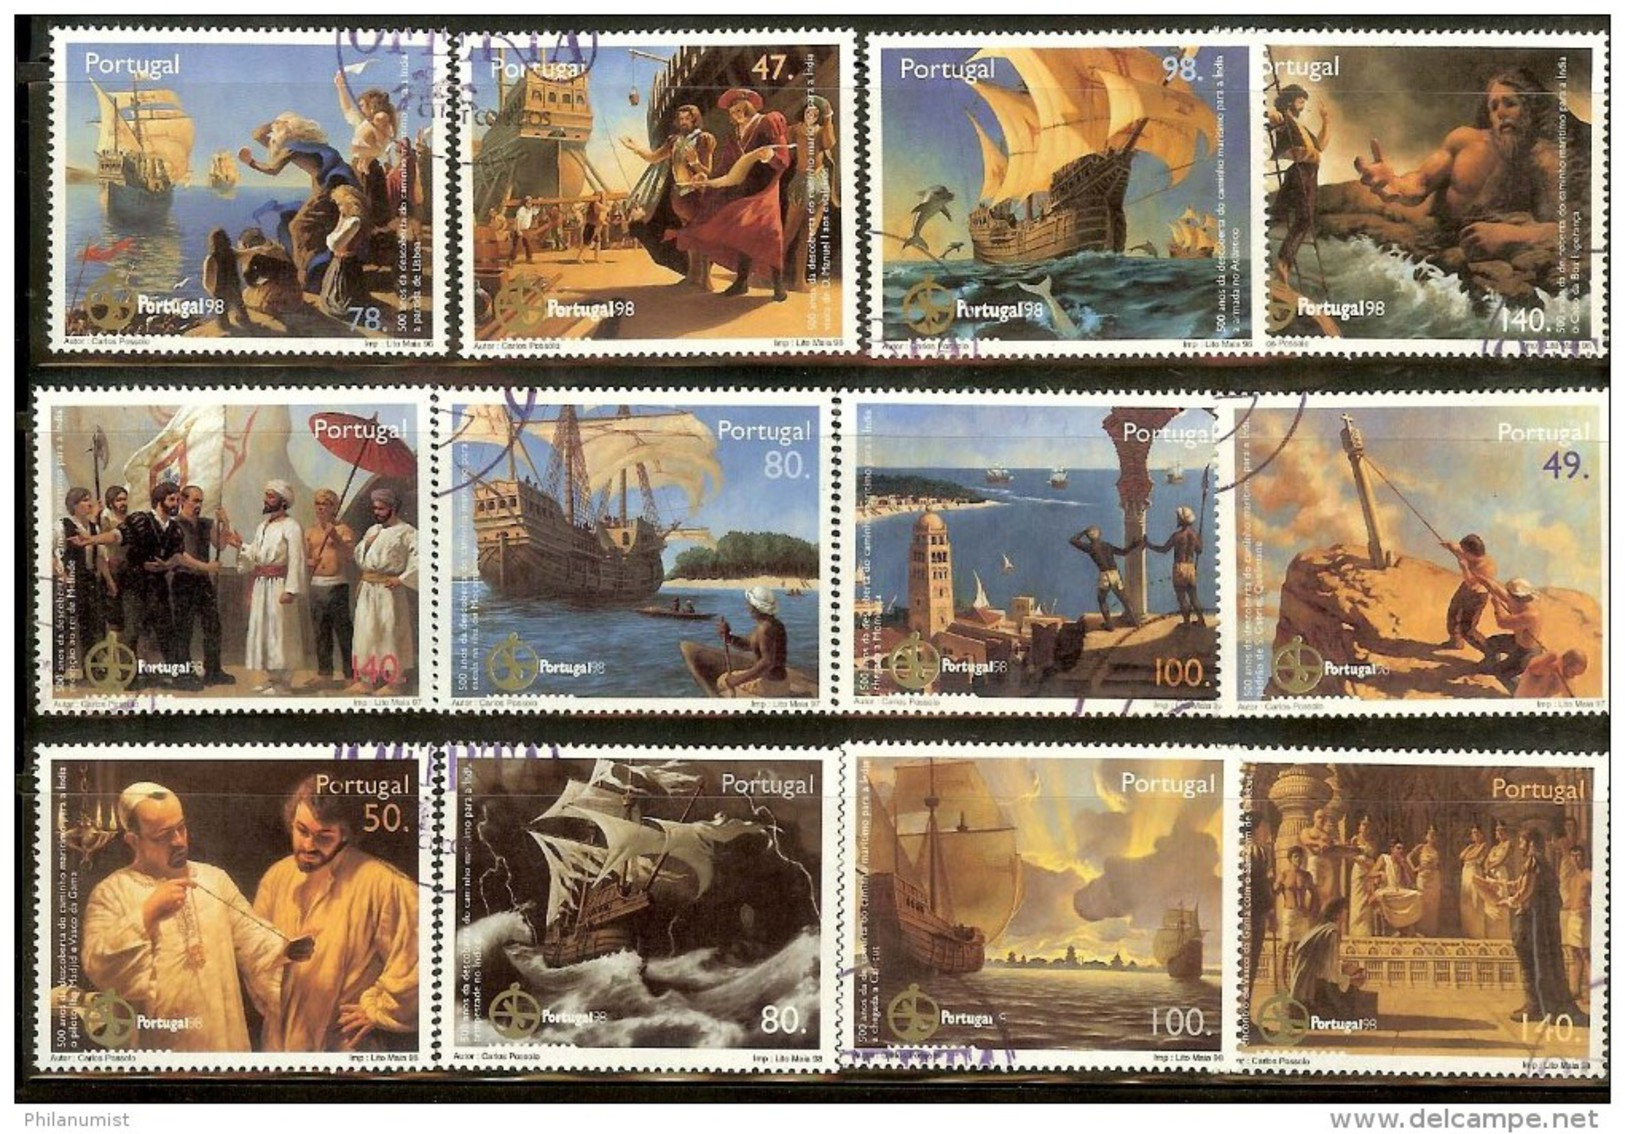 PORTUGAL 98 DISCOVERY OF INDIA 1998 CTO !! - Non Classés